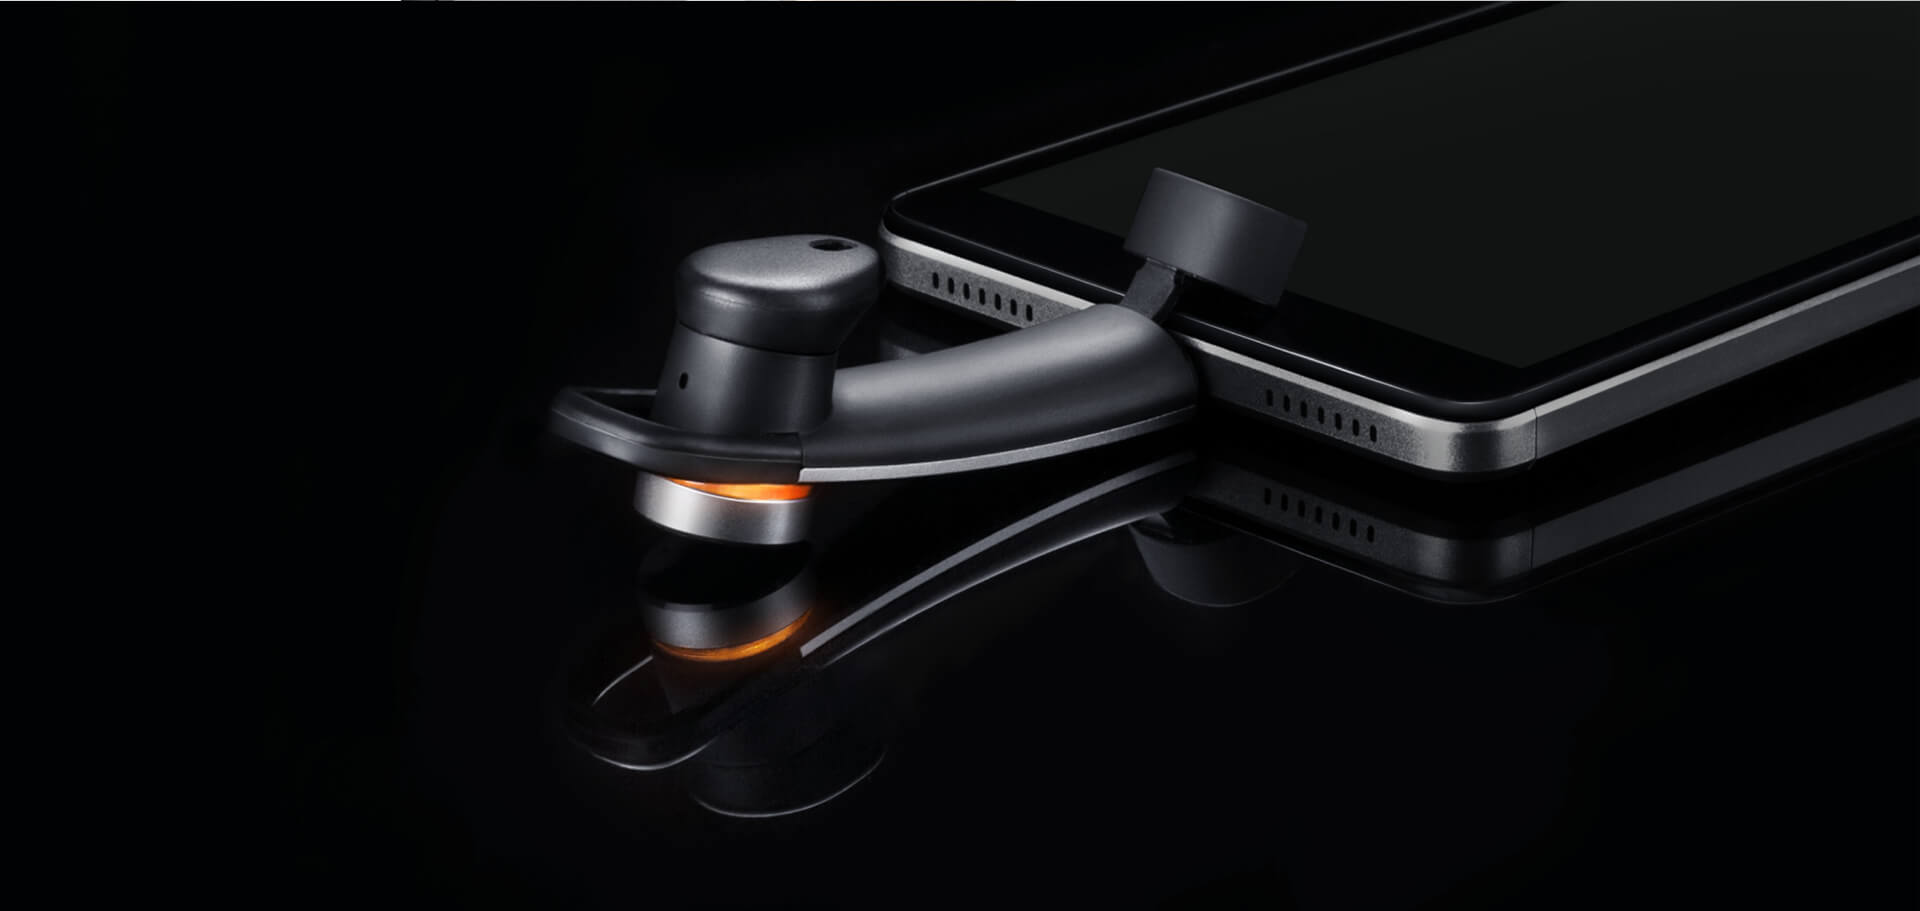 Rechargeable Bluetooth Wireless Earphones